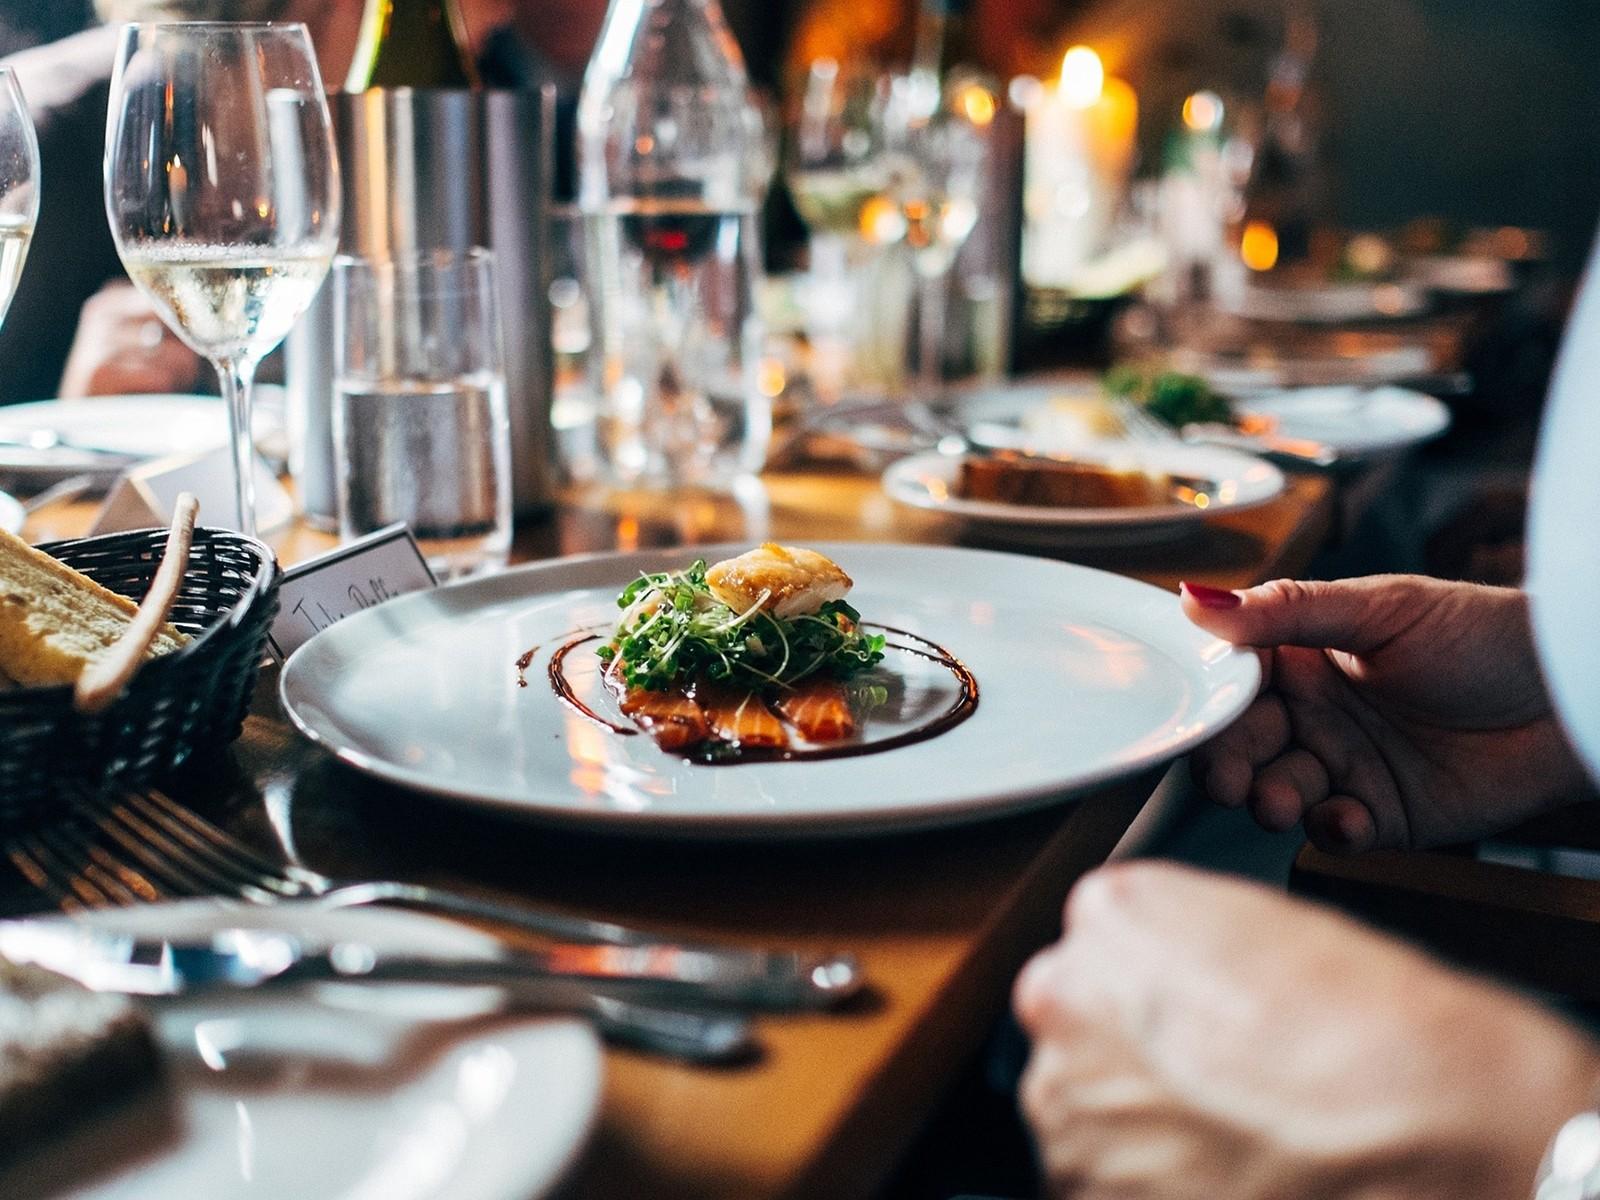 Helfer/in in der Gastronomie